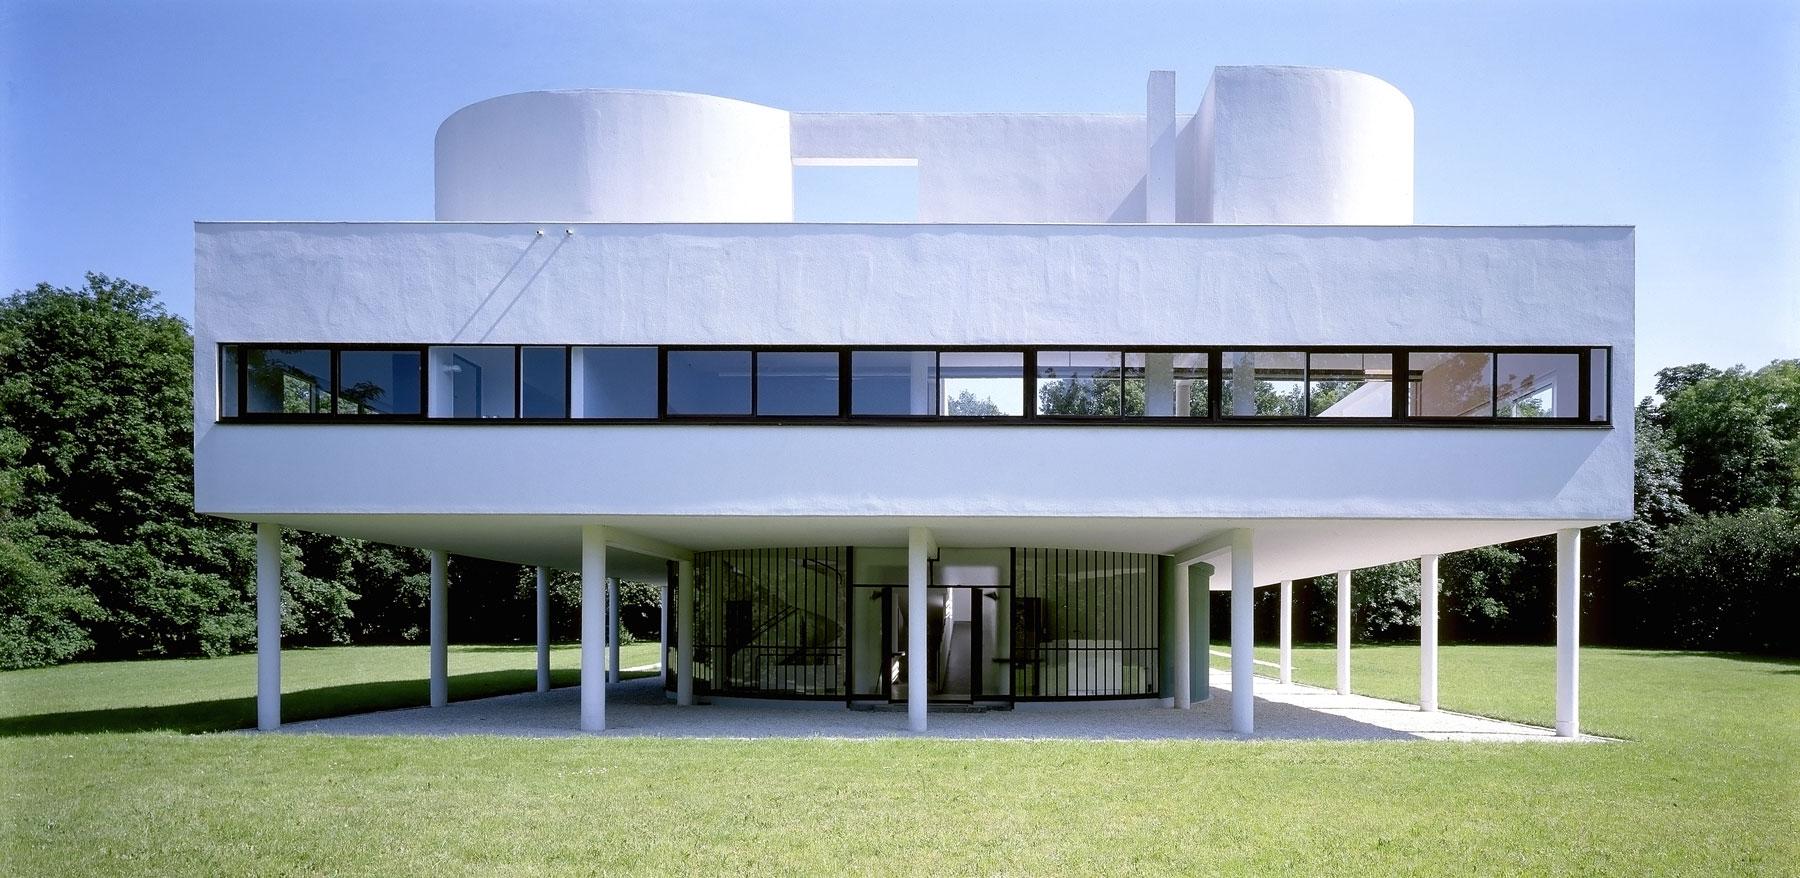 La villa savoye ville de poissy for Poissy le corbusier